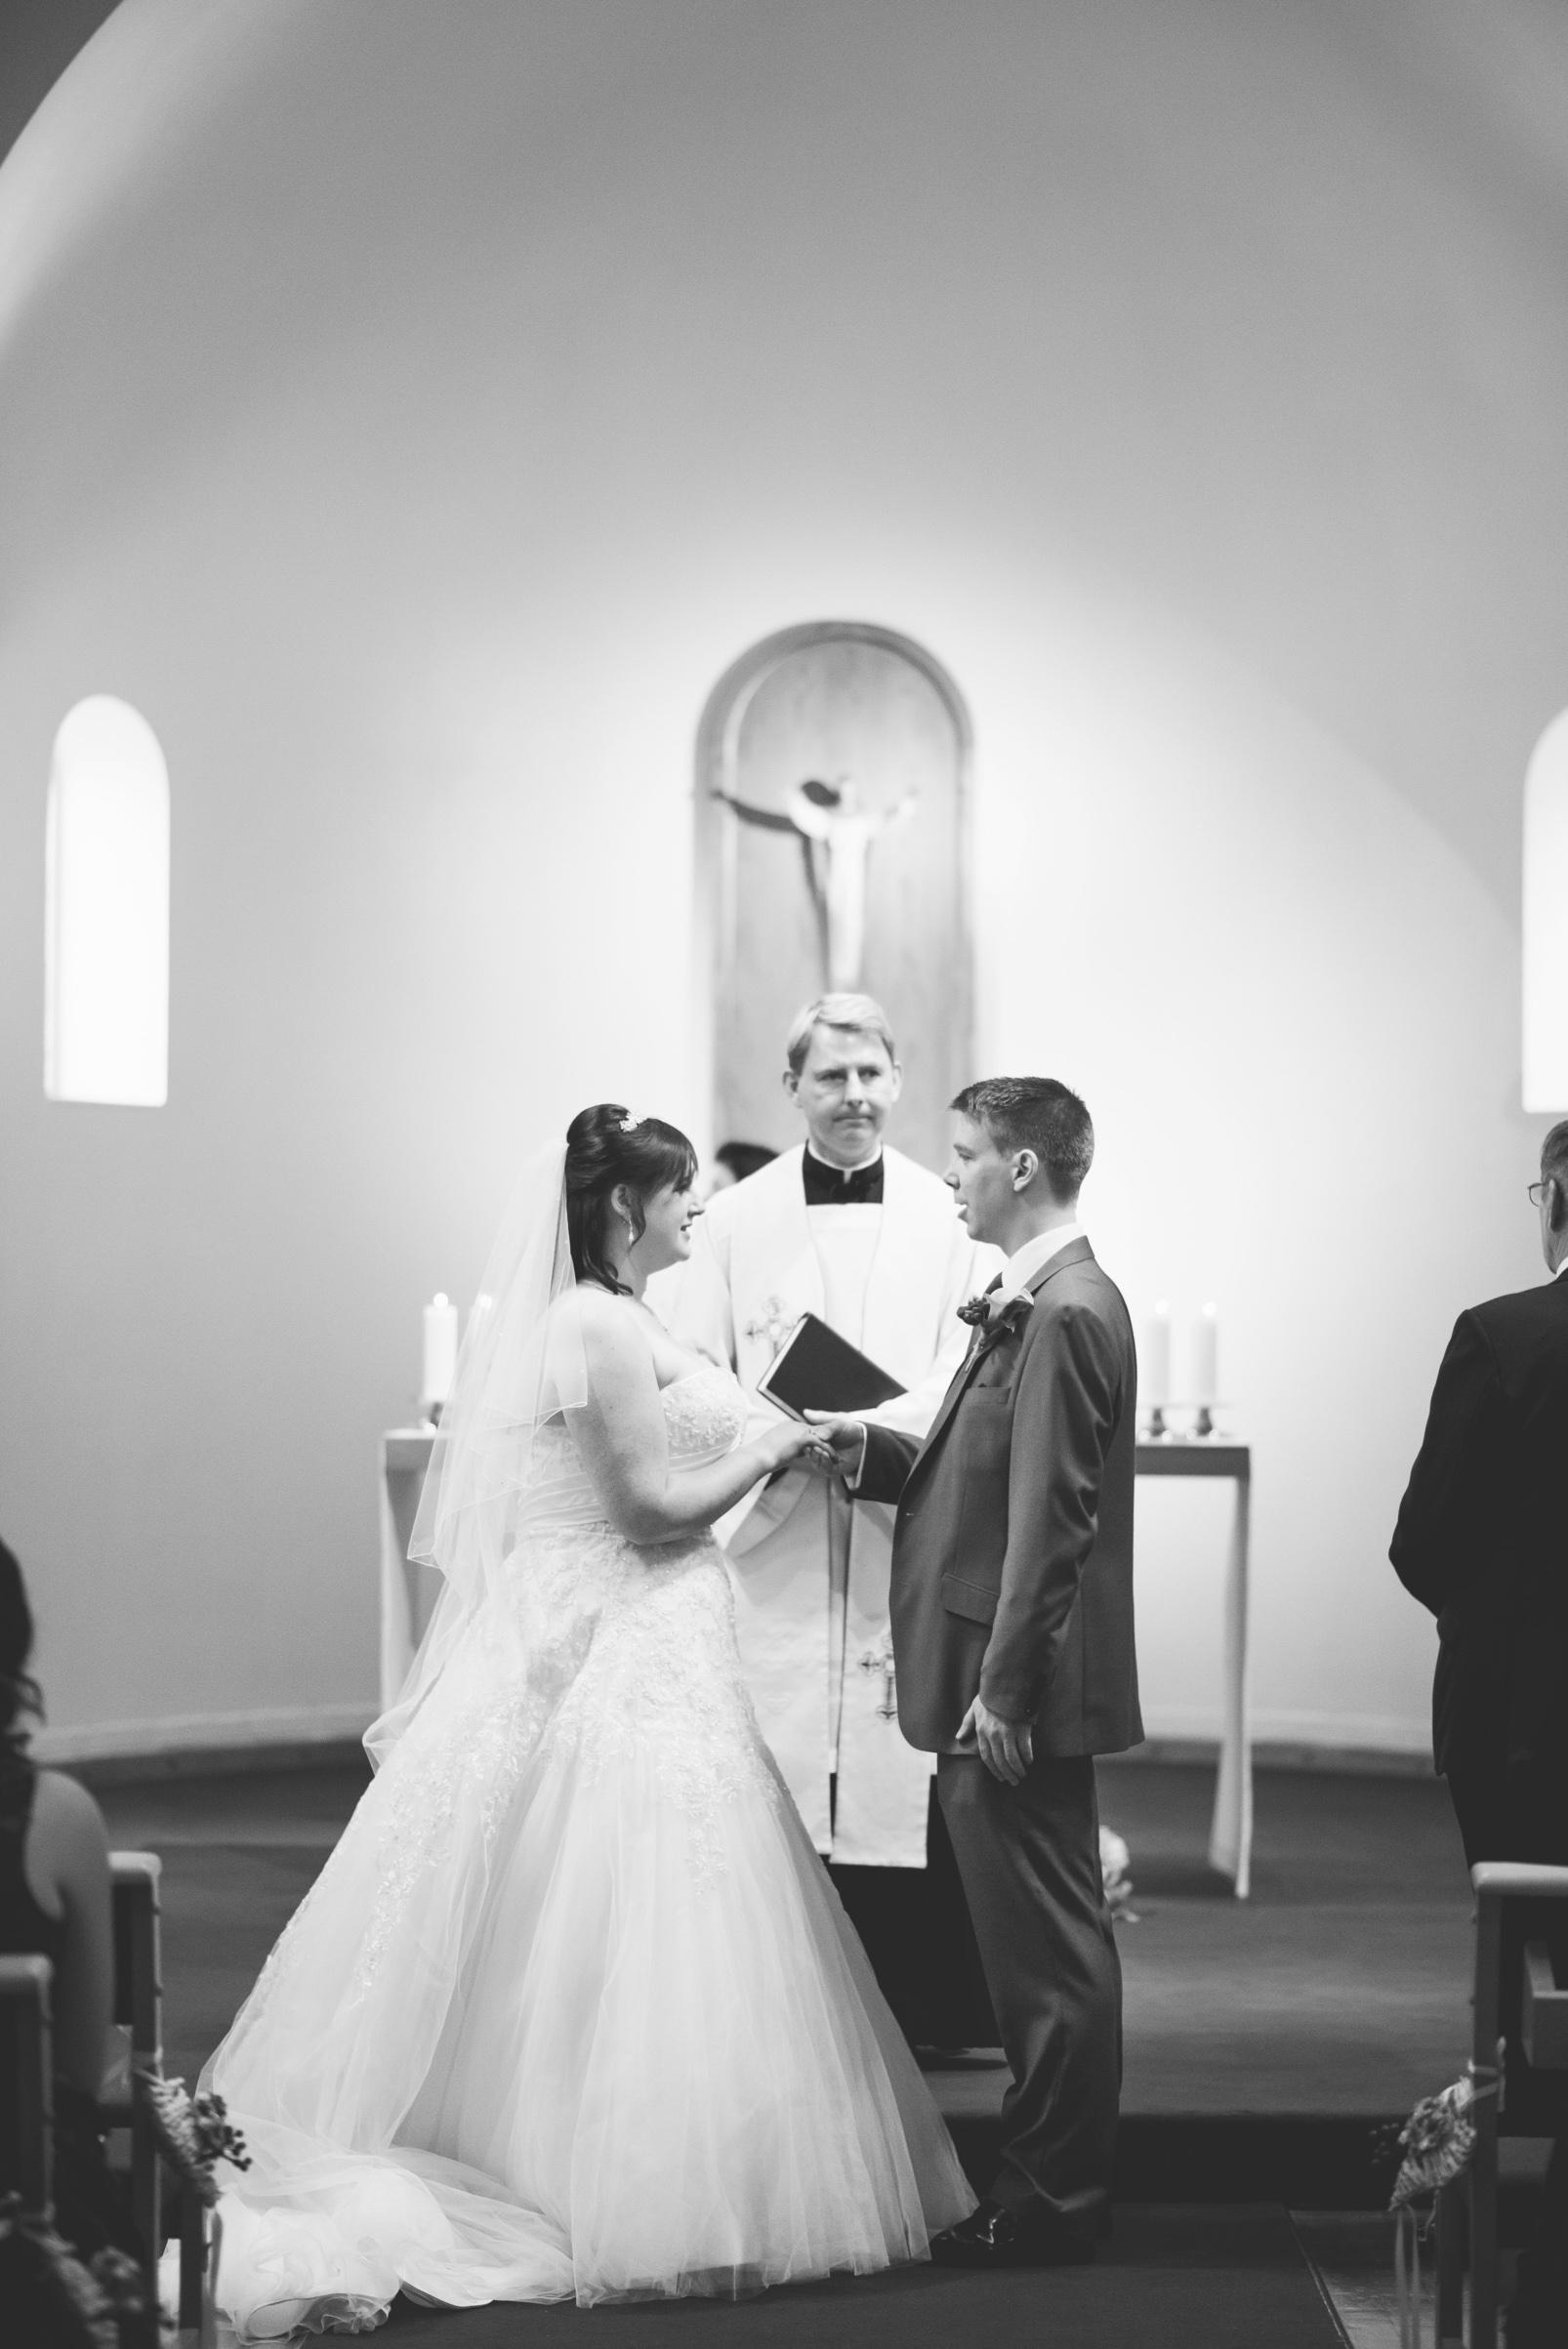 The+Fairlawns+wedding+Aldridge+StLukes+Church-90.jpg